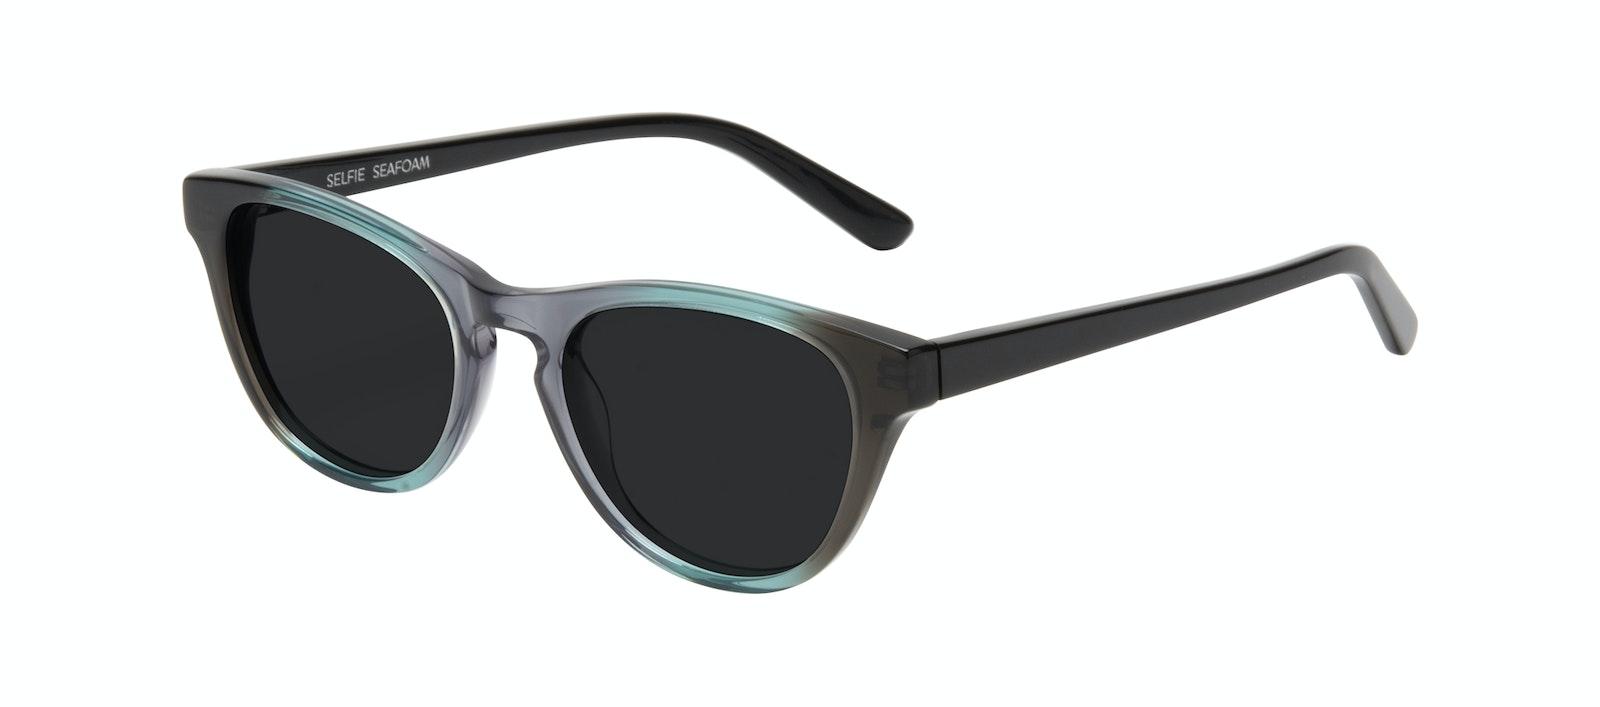 Affordable Fashion Glasses Cat Eye Sunglasses Women Selfie Seafoam Tilt